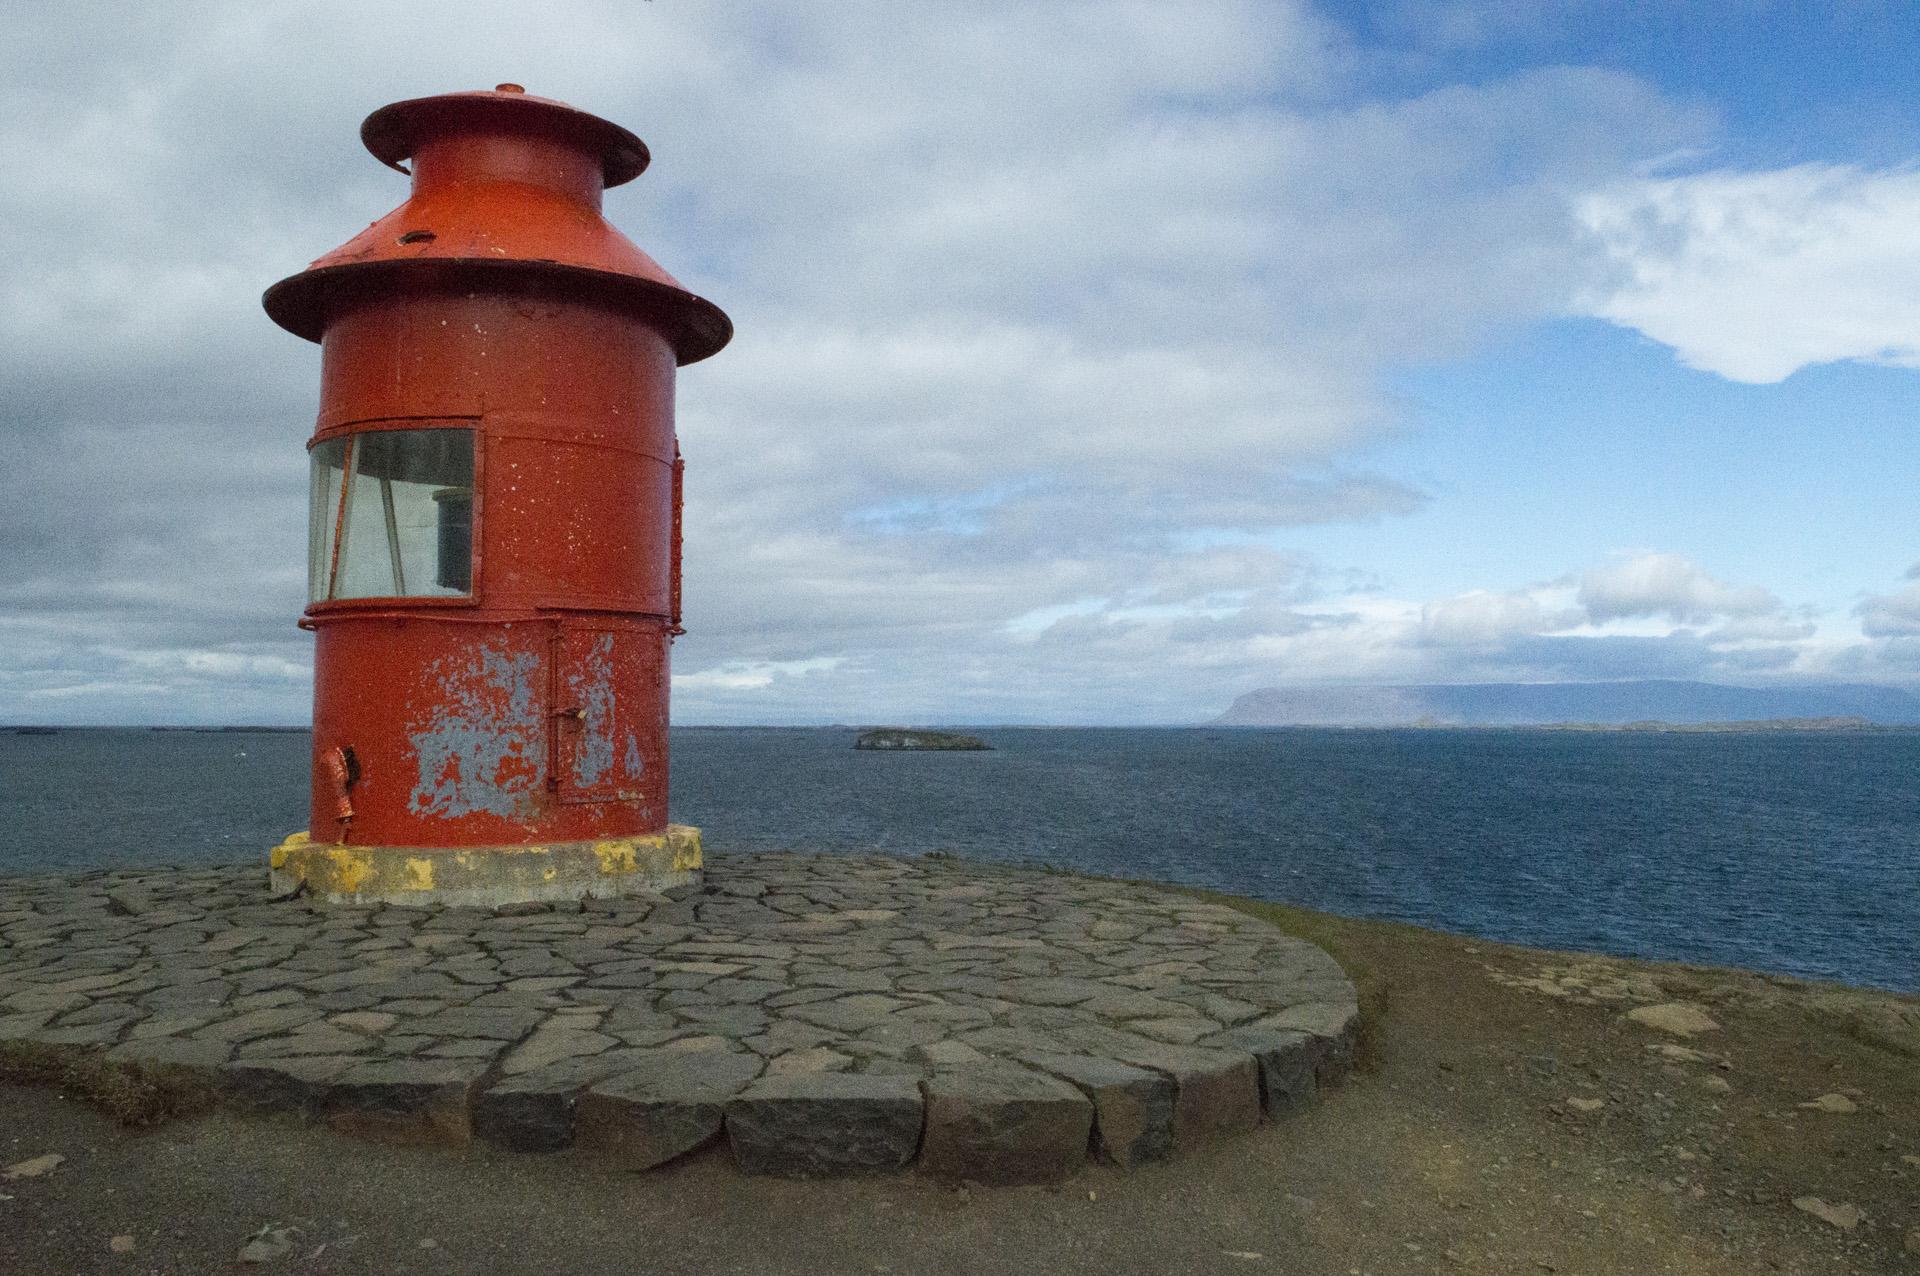 Photos: Stykkishólmur and Súgandisey